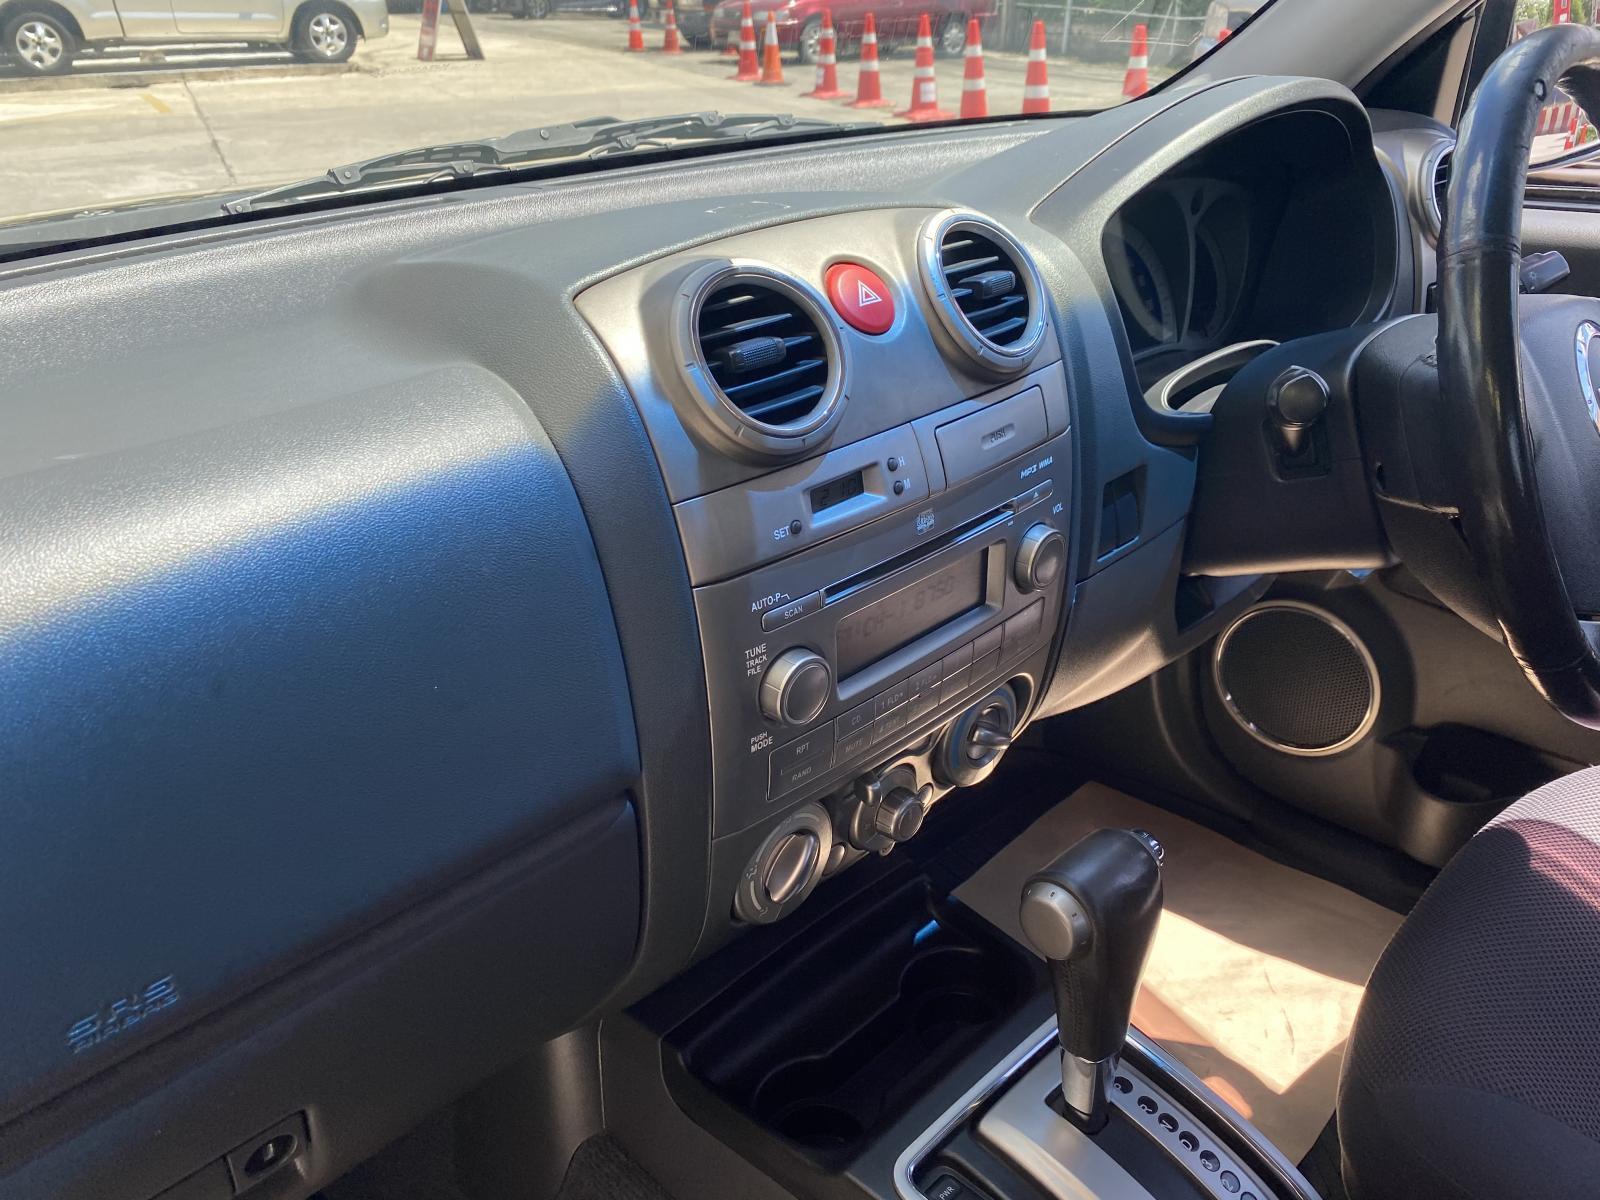 2009 Isuzu D-Max 3.0 SLX Platinum รถกระบะ